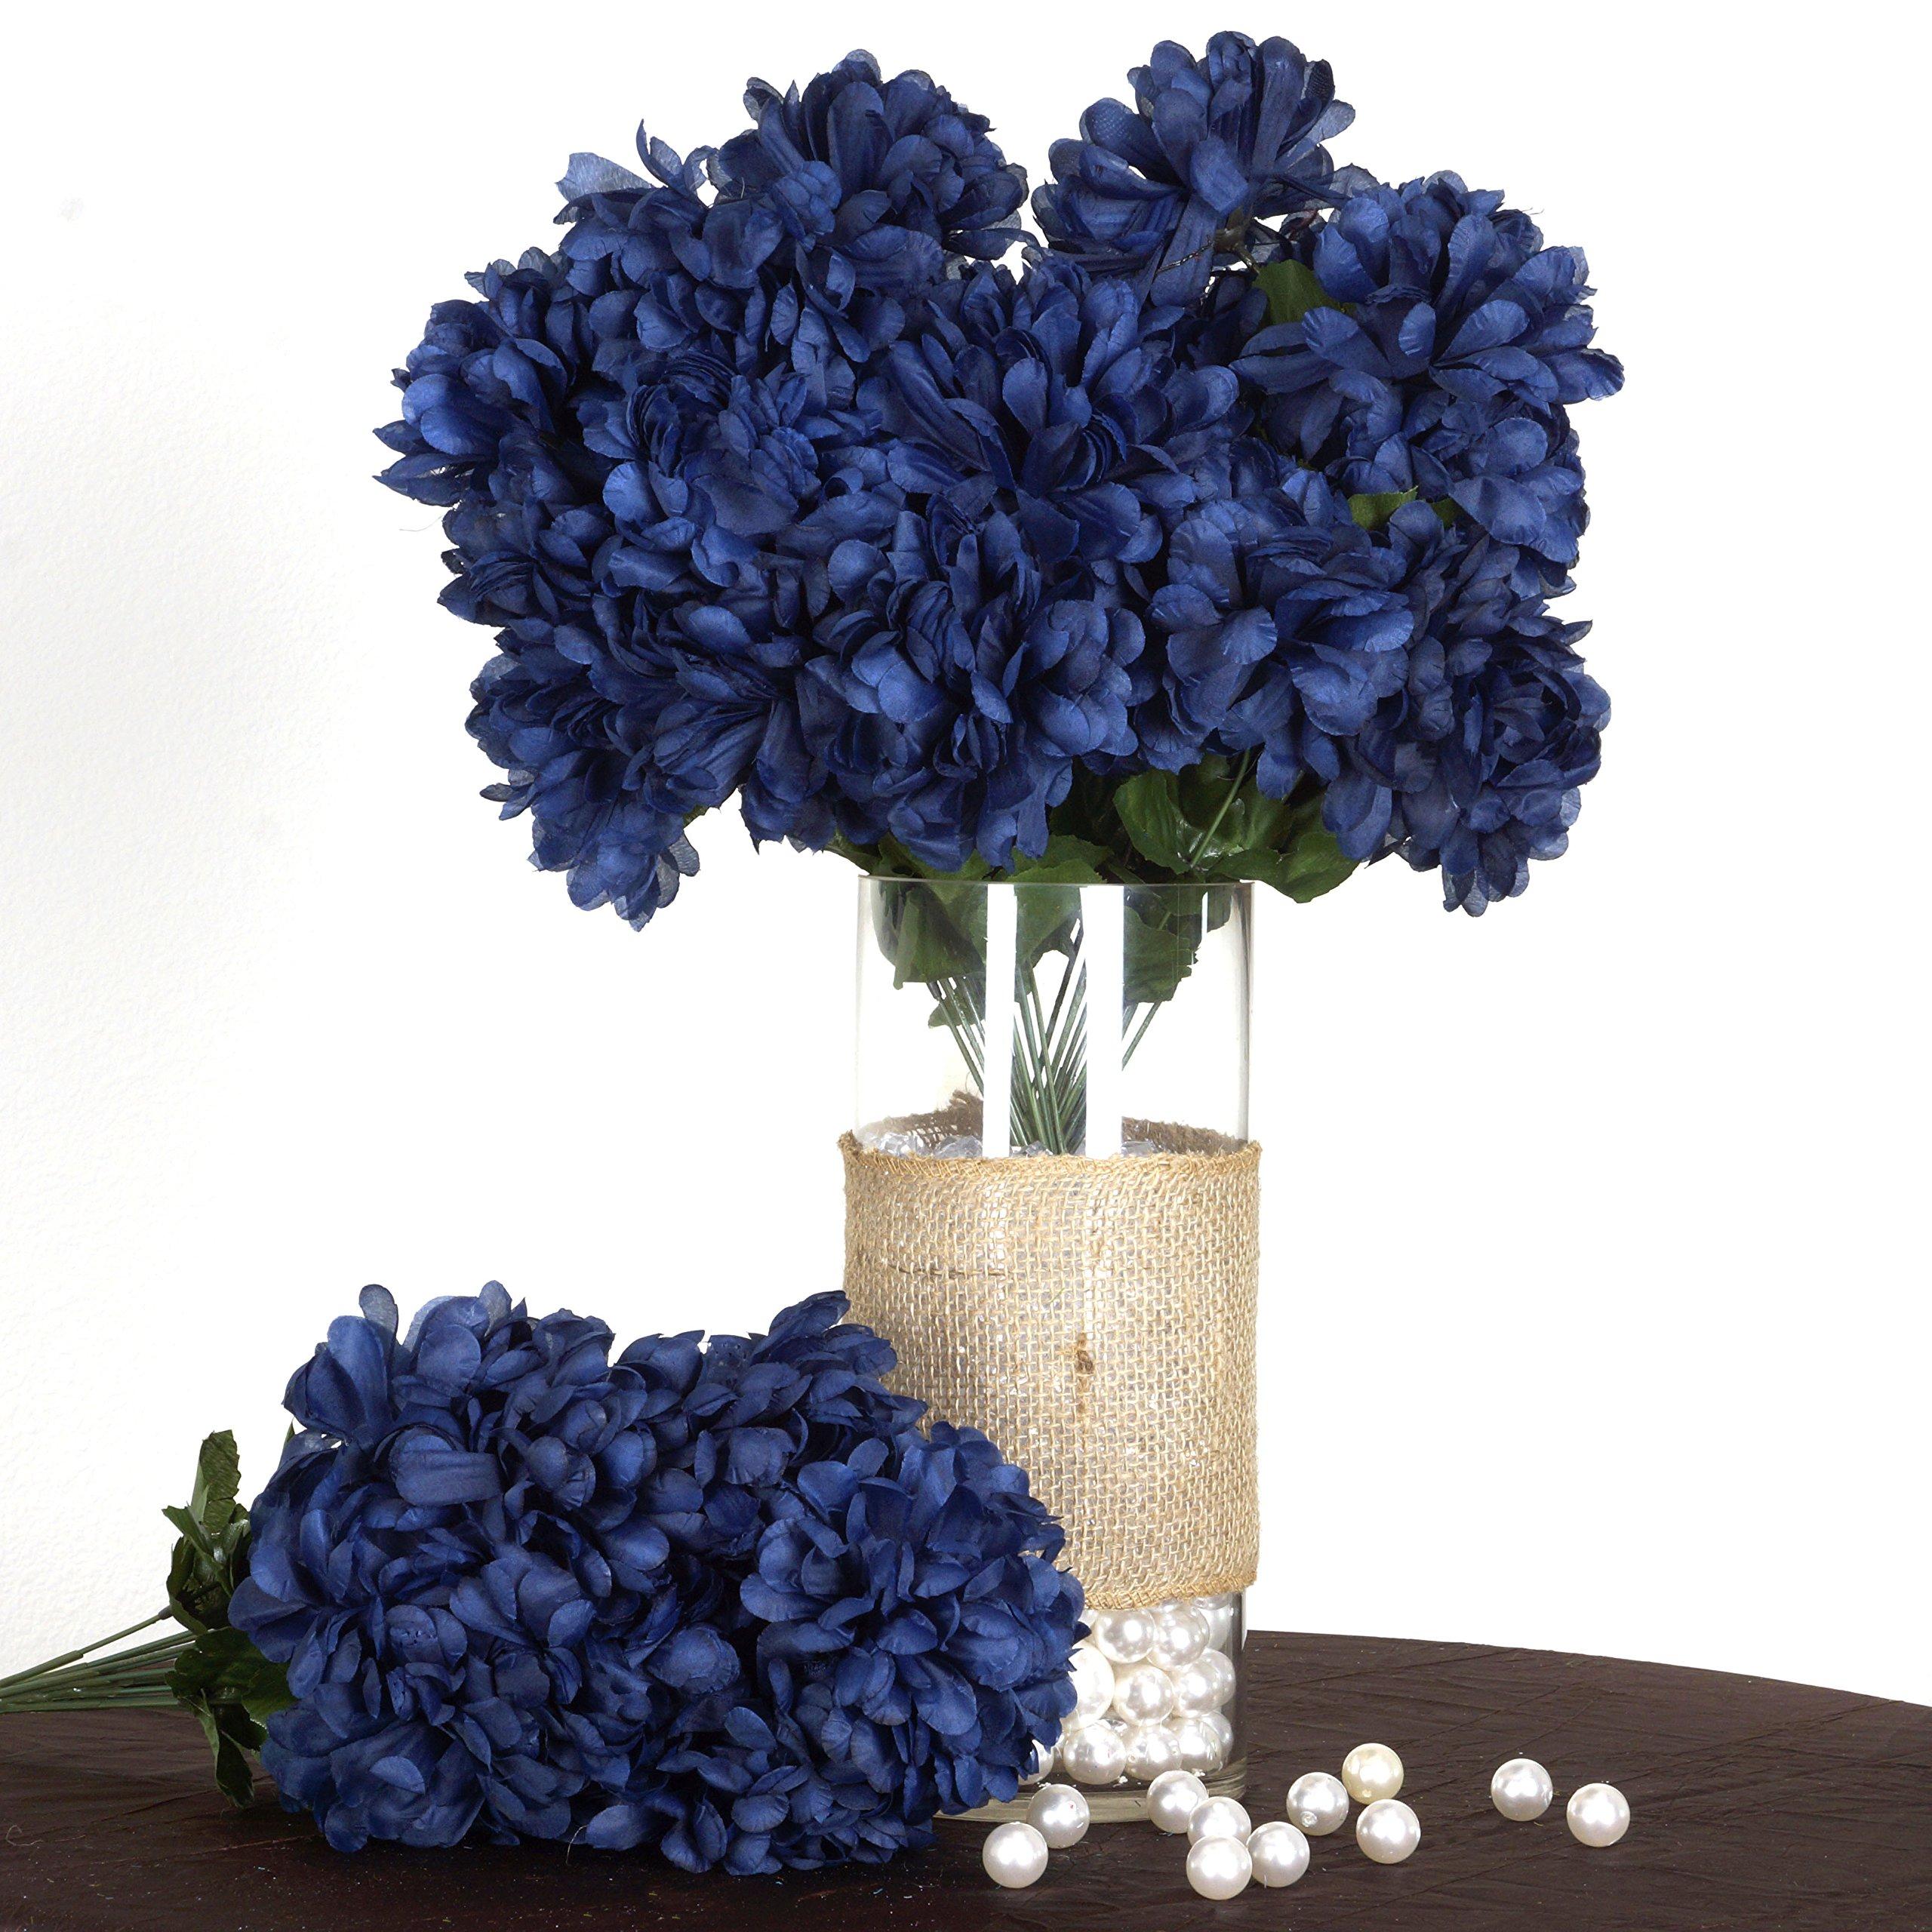 Cheap Blue Mums Flowers Find Blue Mums Flowers Deals On Line At